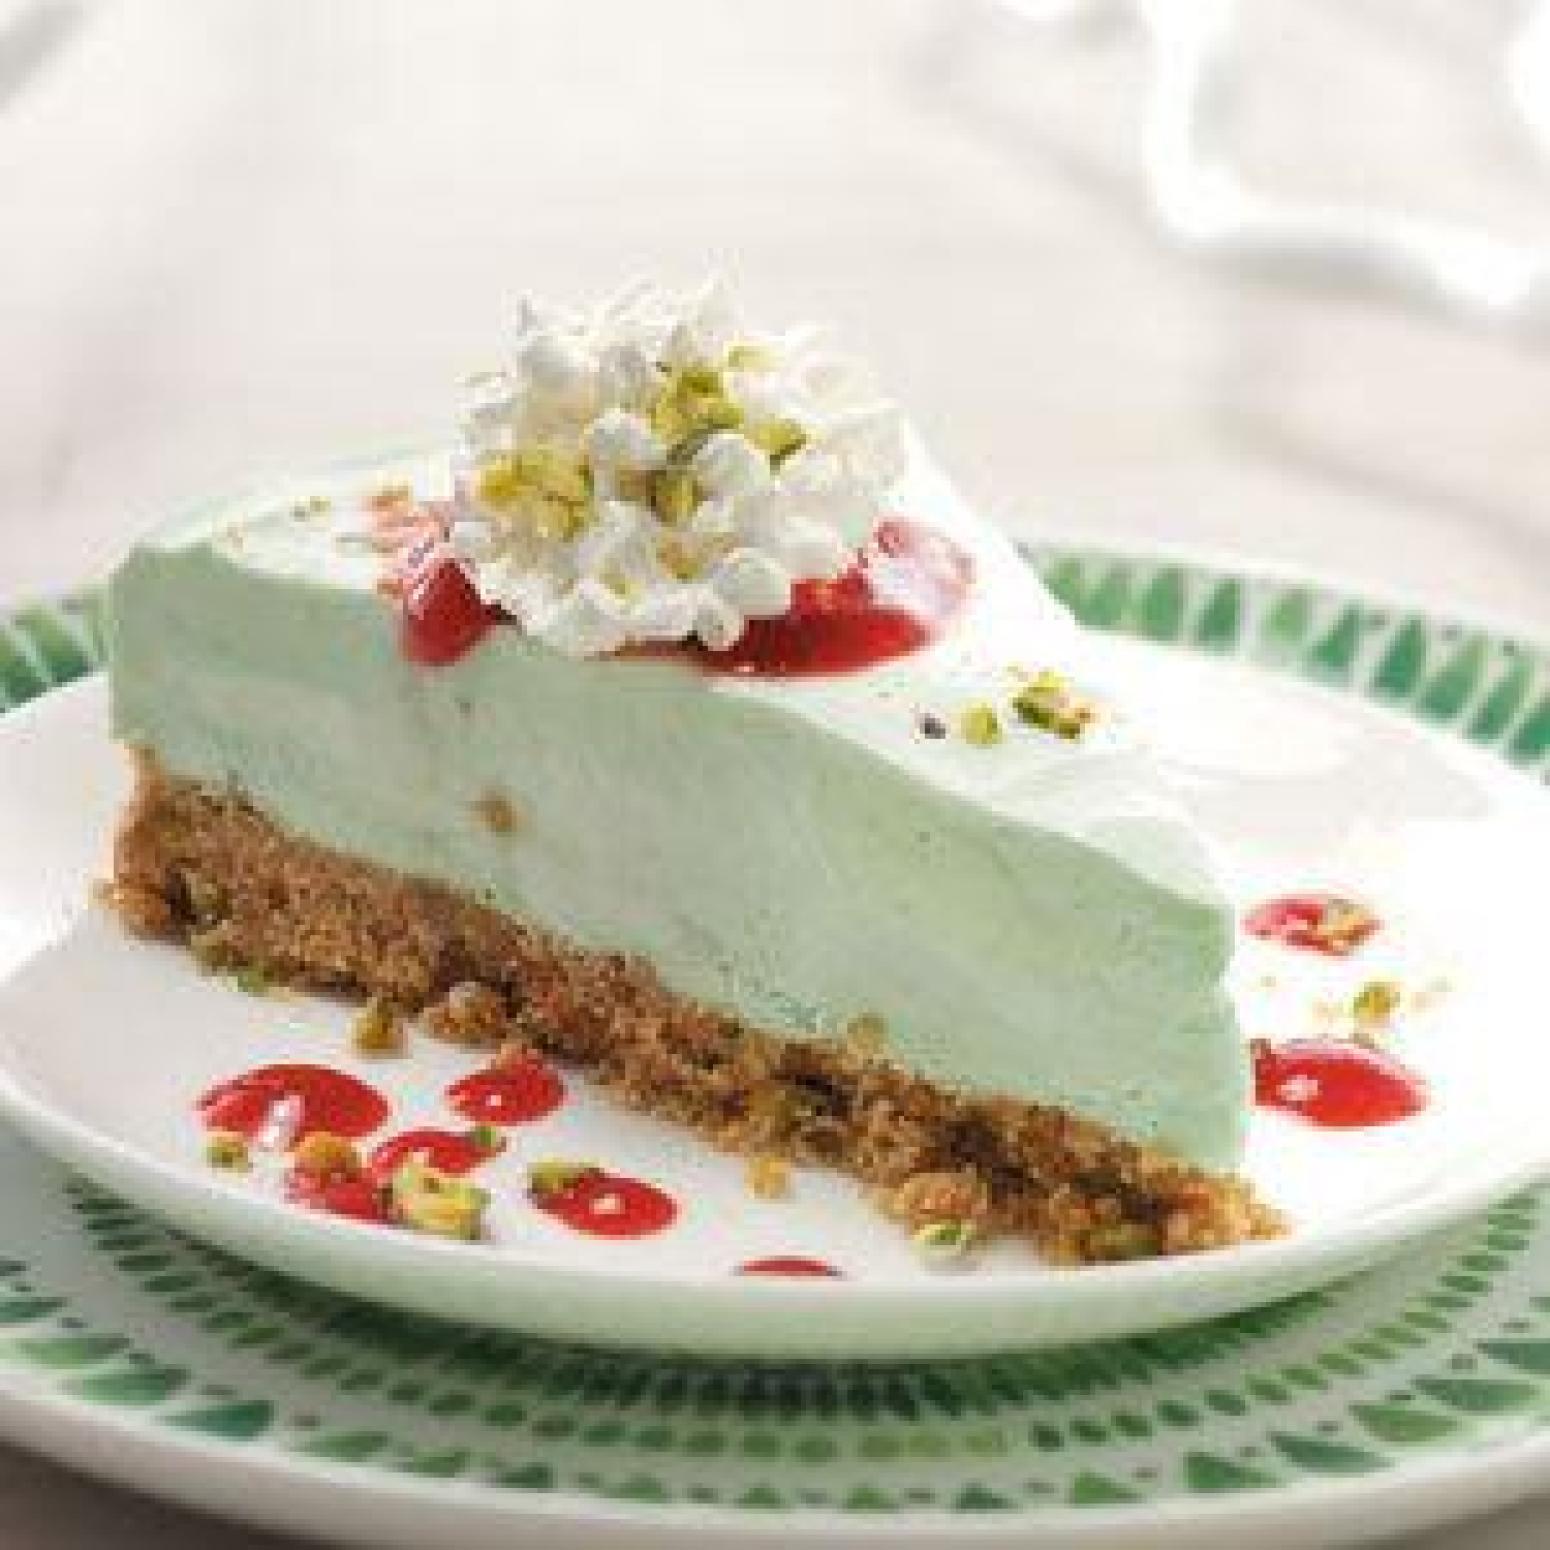 Pistachio Dessert Recipes  Frozen Pistachio Dessert With Raspberry Sauce Recipe